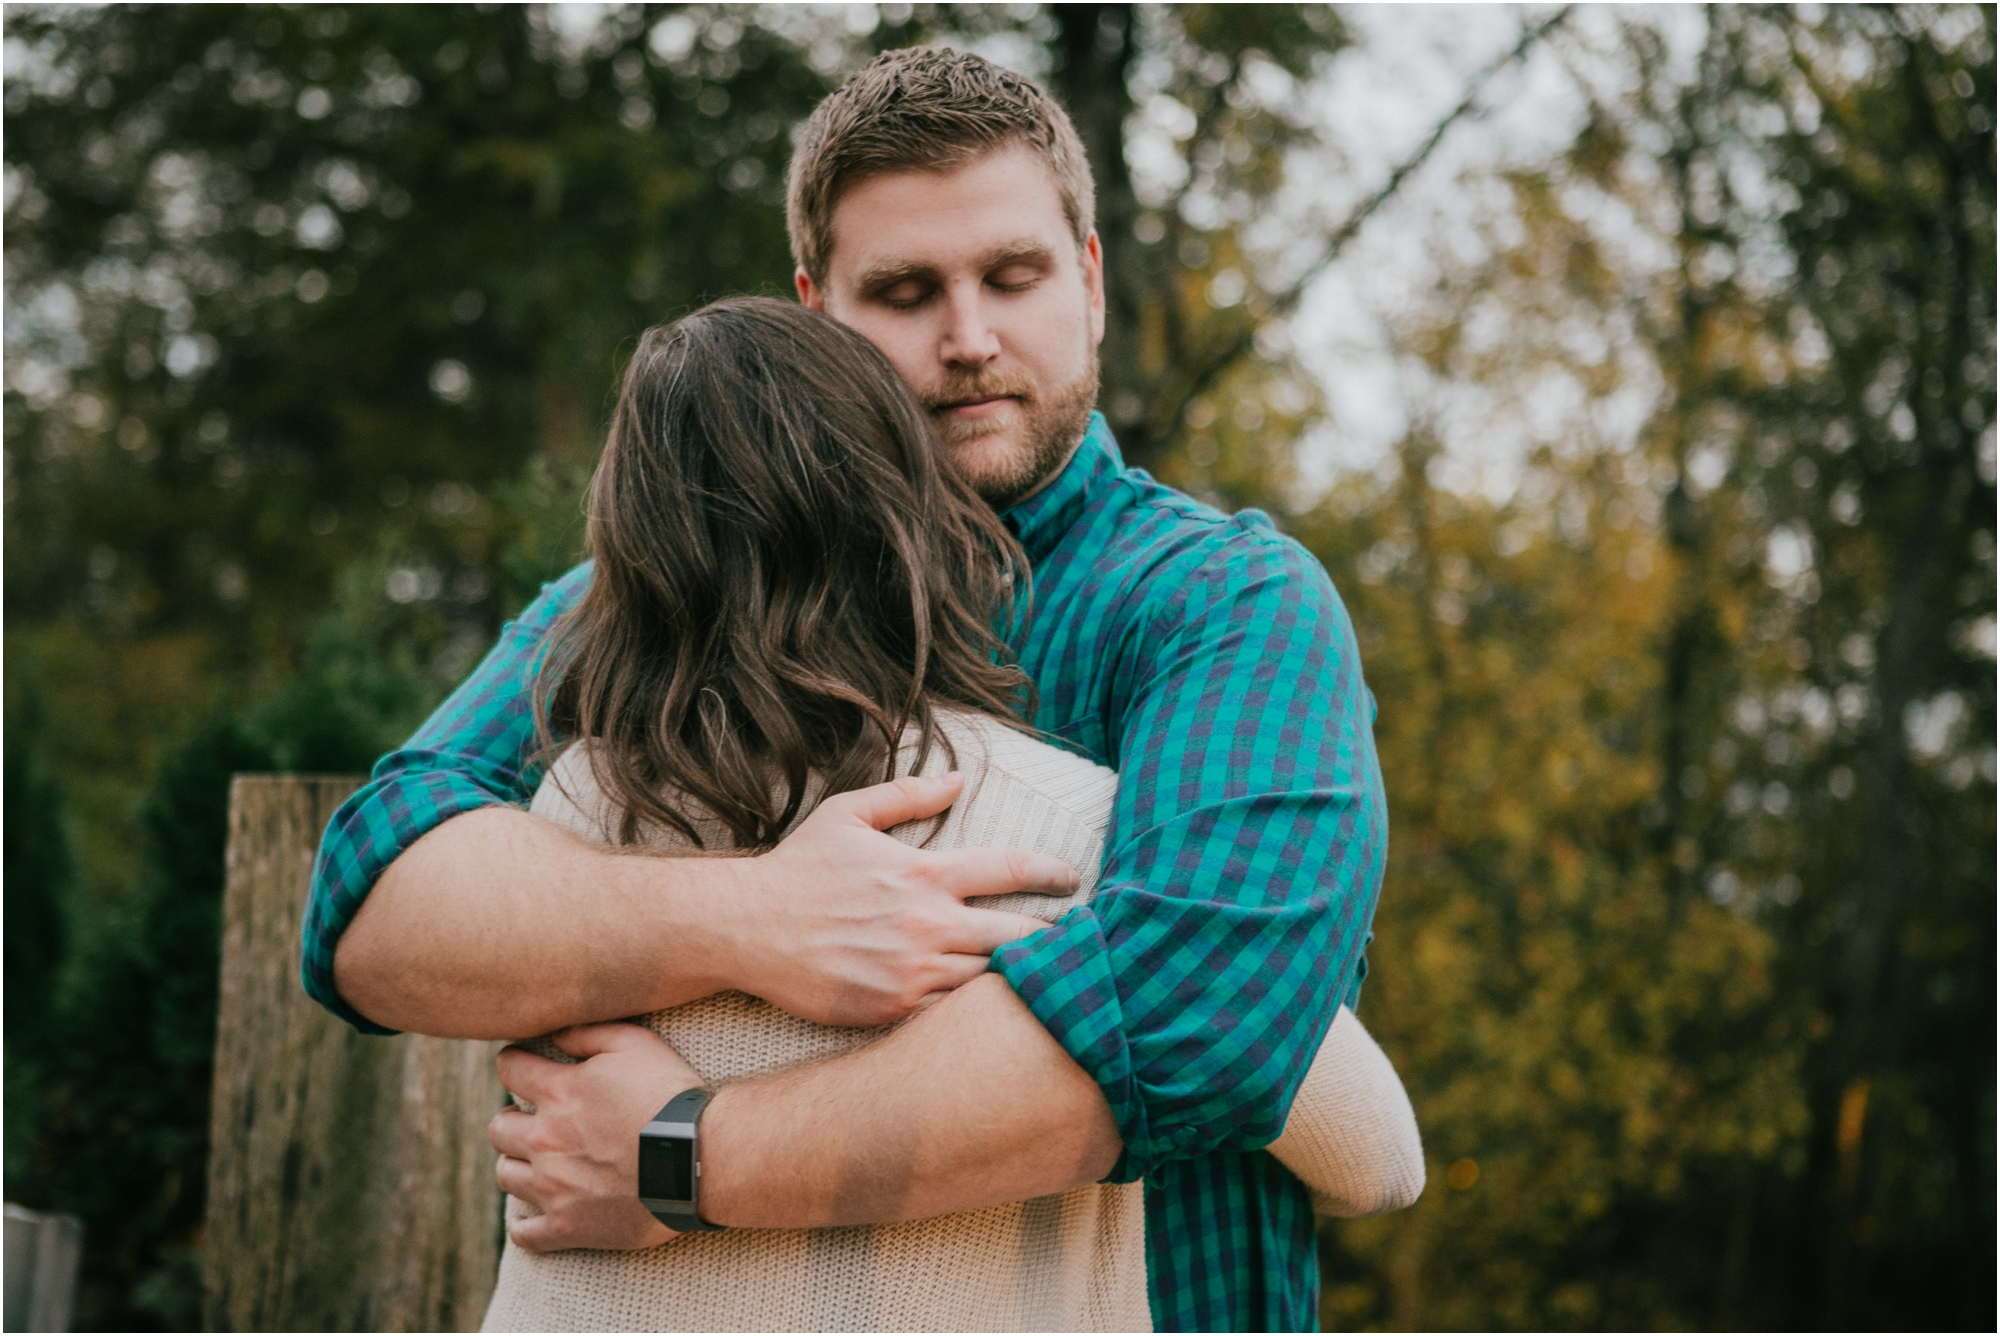 katy-sergent-millstone-limestone-tn-rustic-fall-engagement-session-adventurous-outdoors-intimate-elopement-wedding-northeast-johnson-city-photographer_0038.jpg